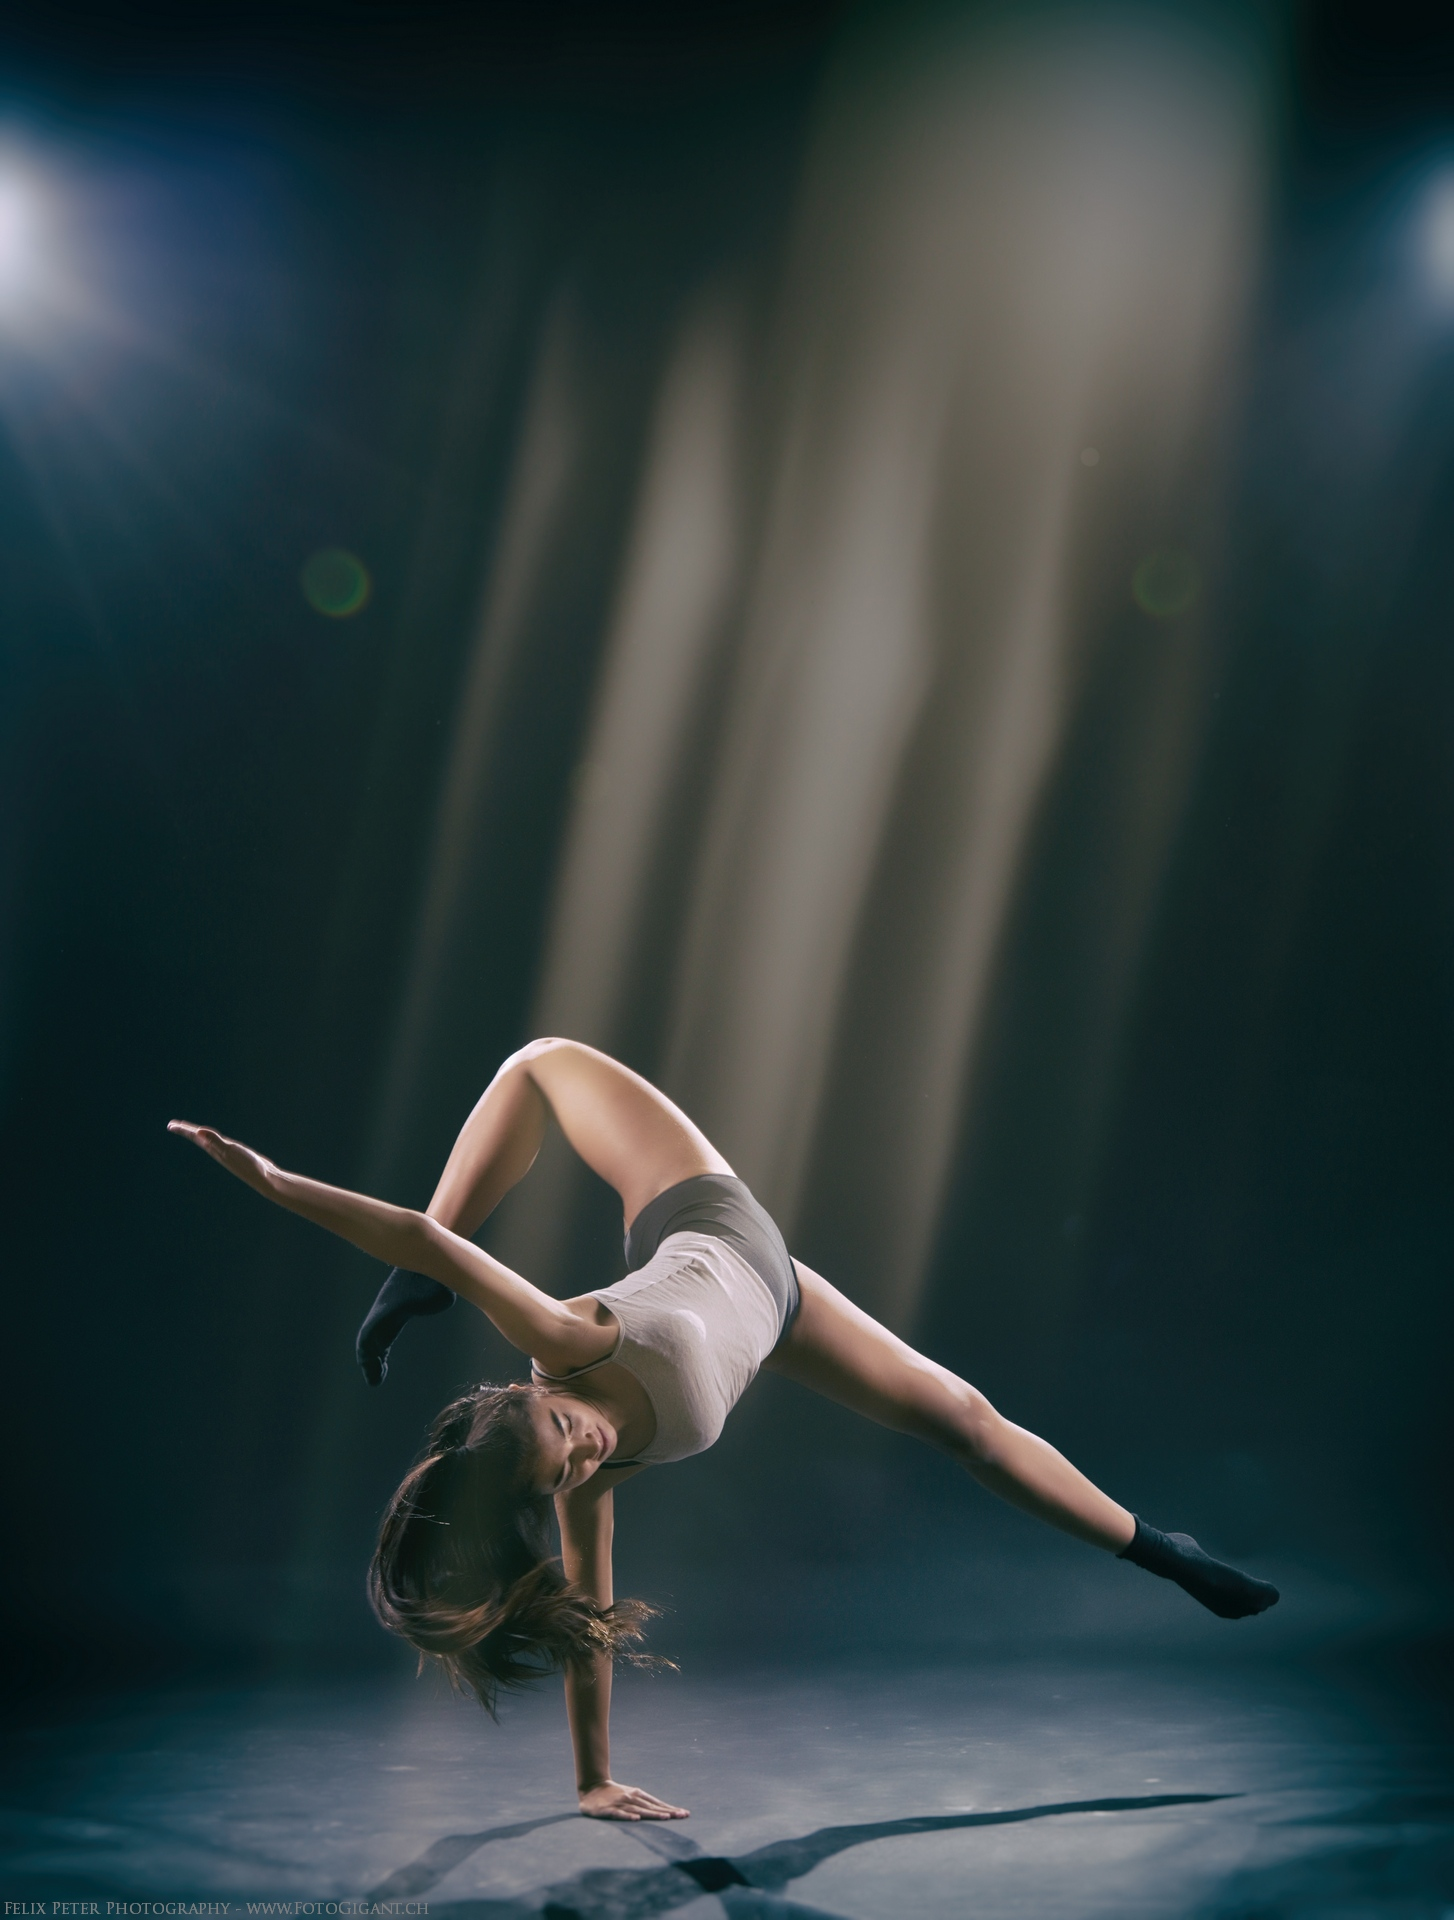 Felix-Peter-Yoga-Pilates-Dance-Fotografie_Bern_096.jpg